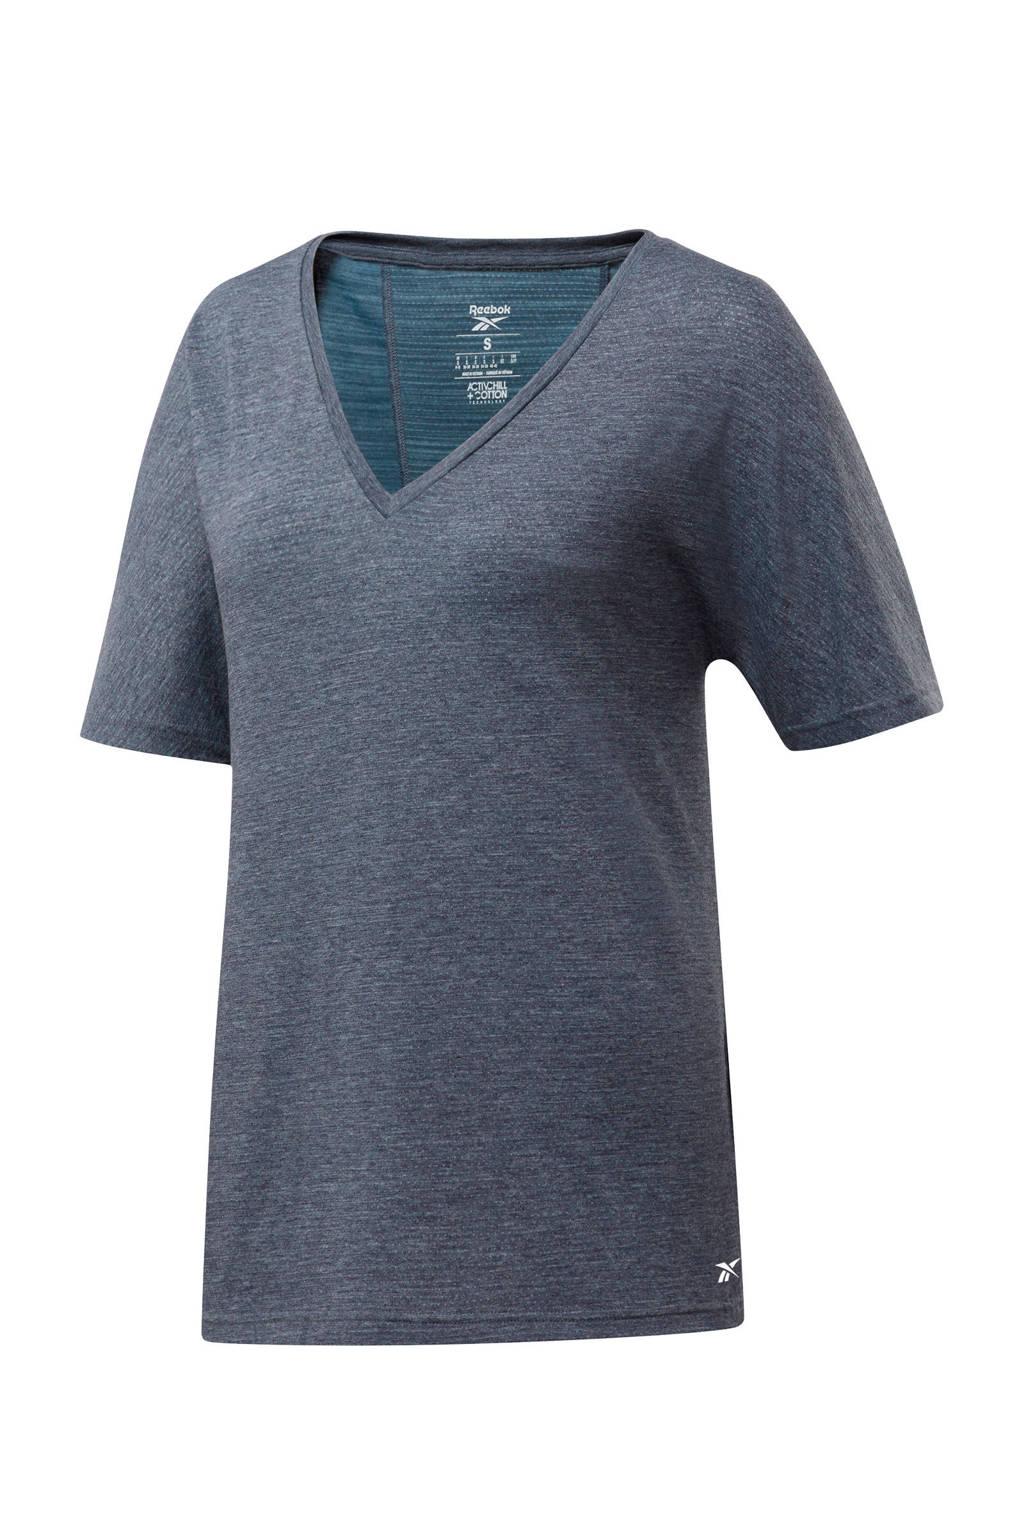 Reebok Training Plus Size sport T-shirt grijs, Grijs